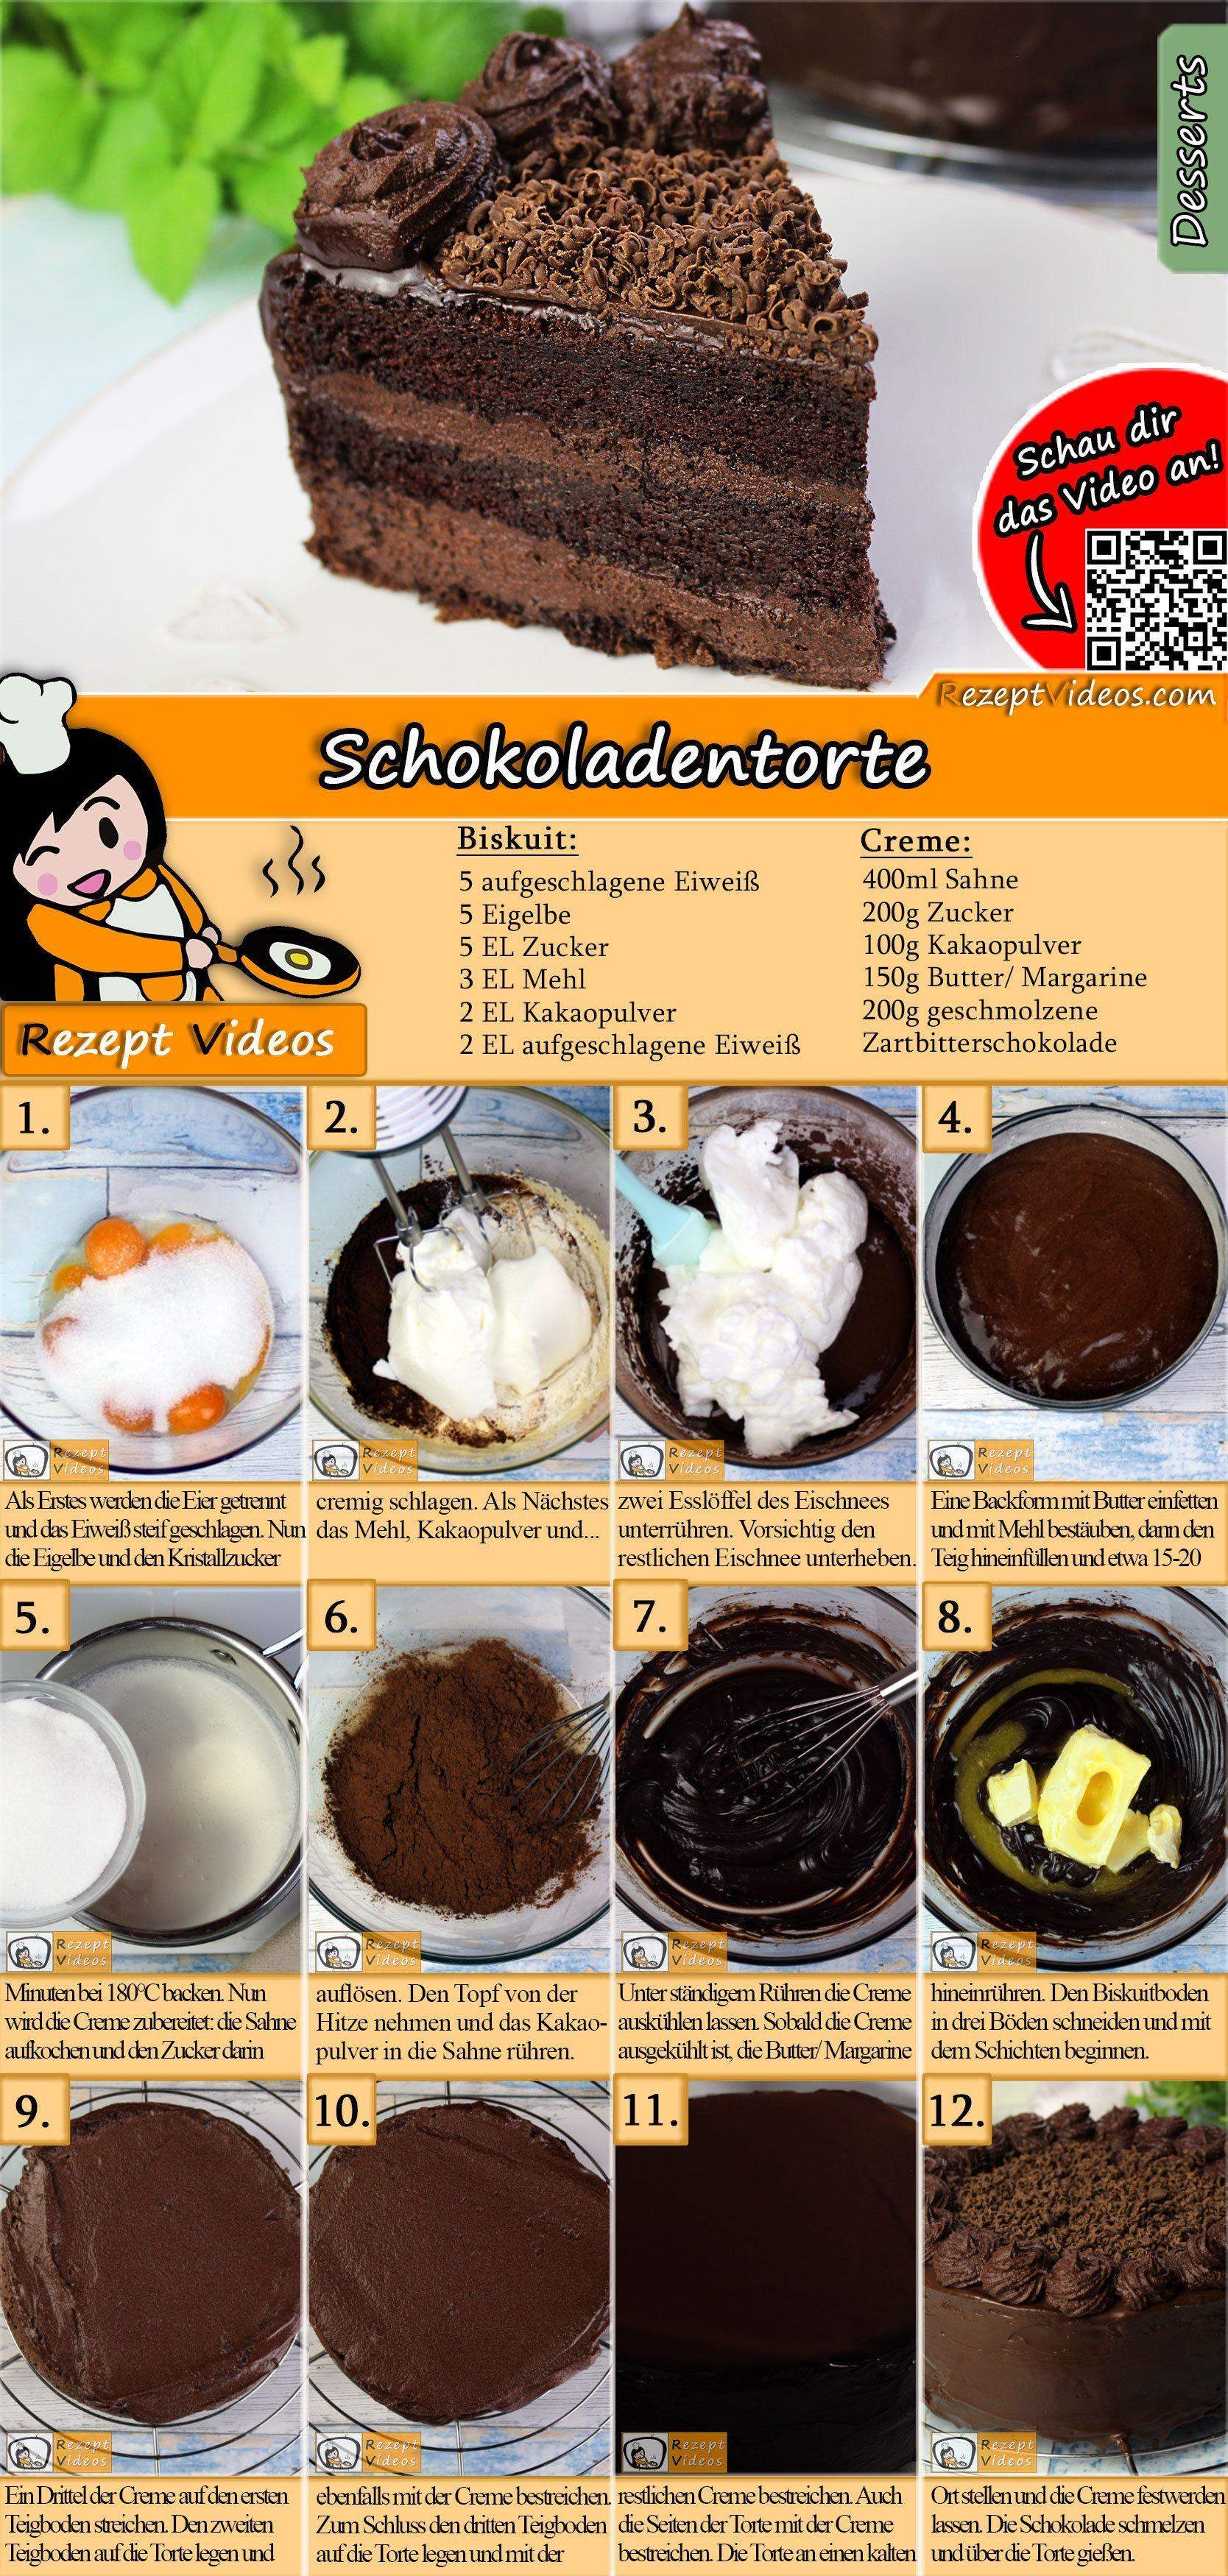 Schokoladentorte Rezept mit Video - Schokokuchen Rezept